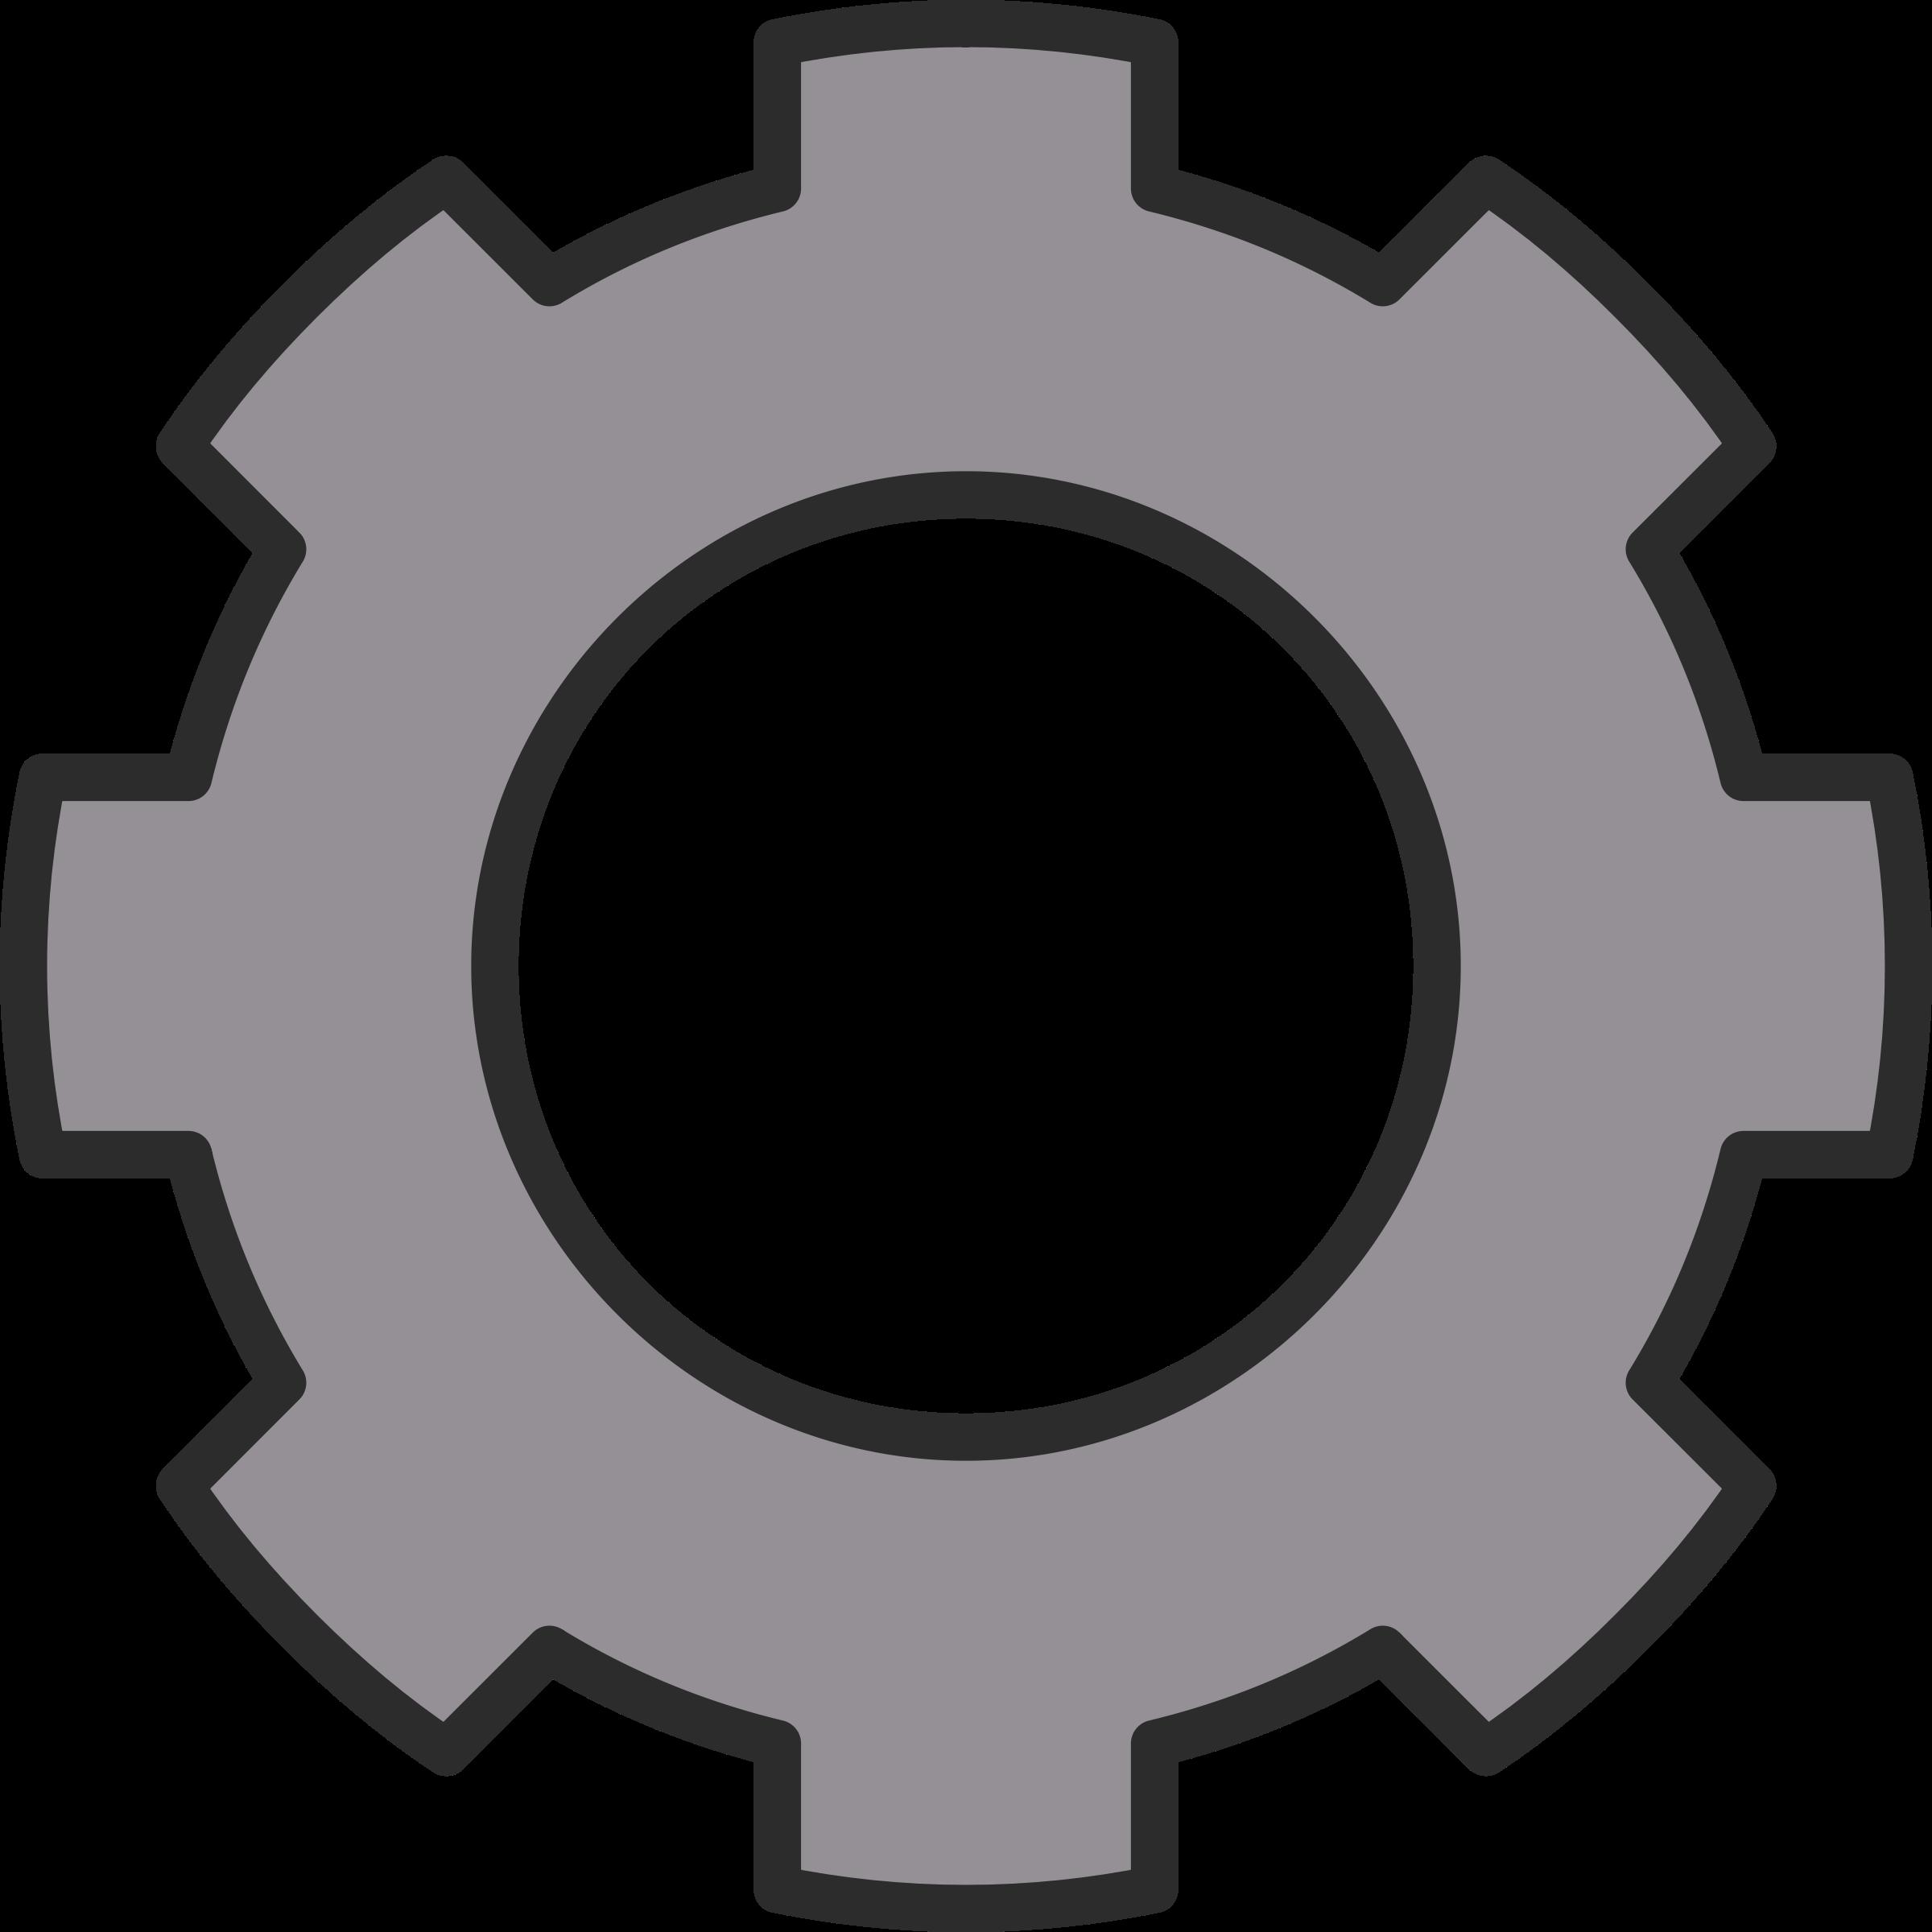 Clip art free panda. Gear clipart environment